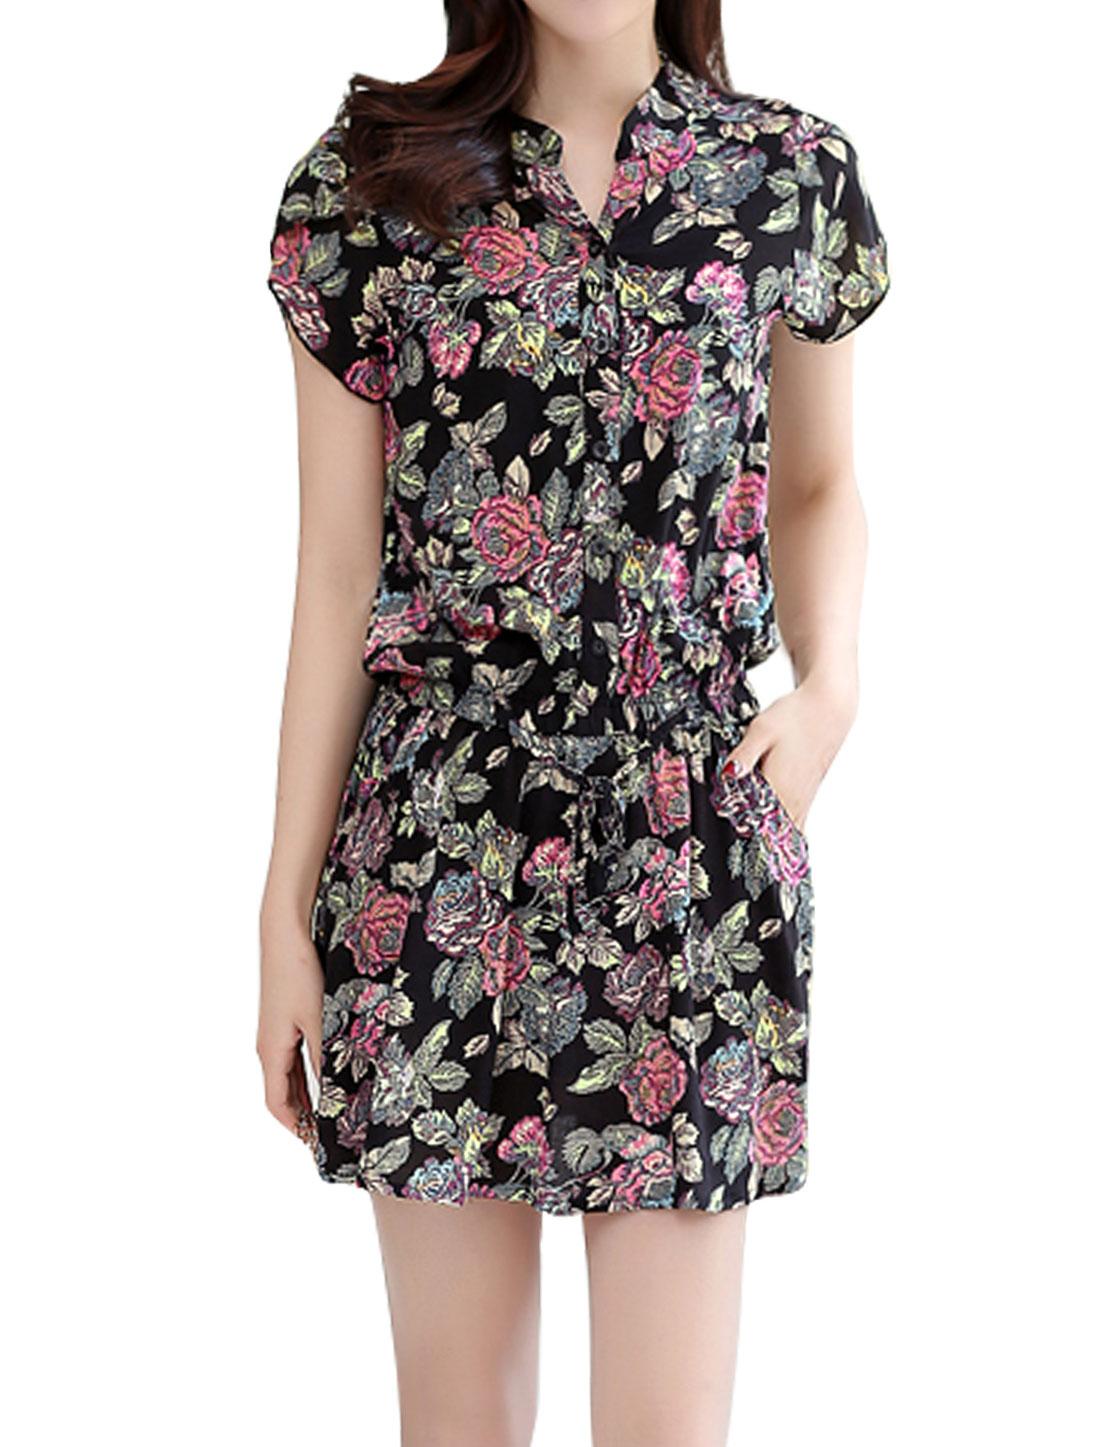 Women Floral Prints Elastic Waist Petal Sleeves Dress Black S